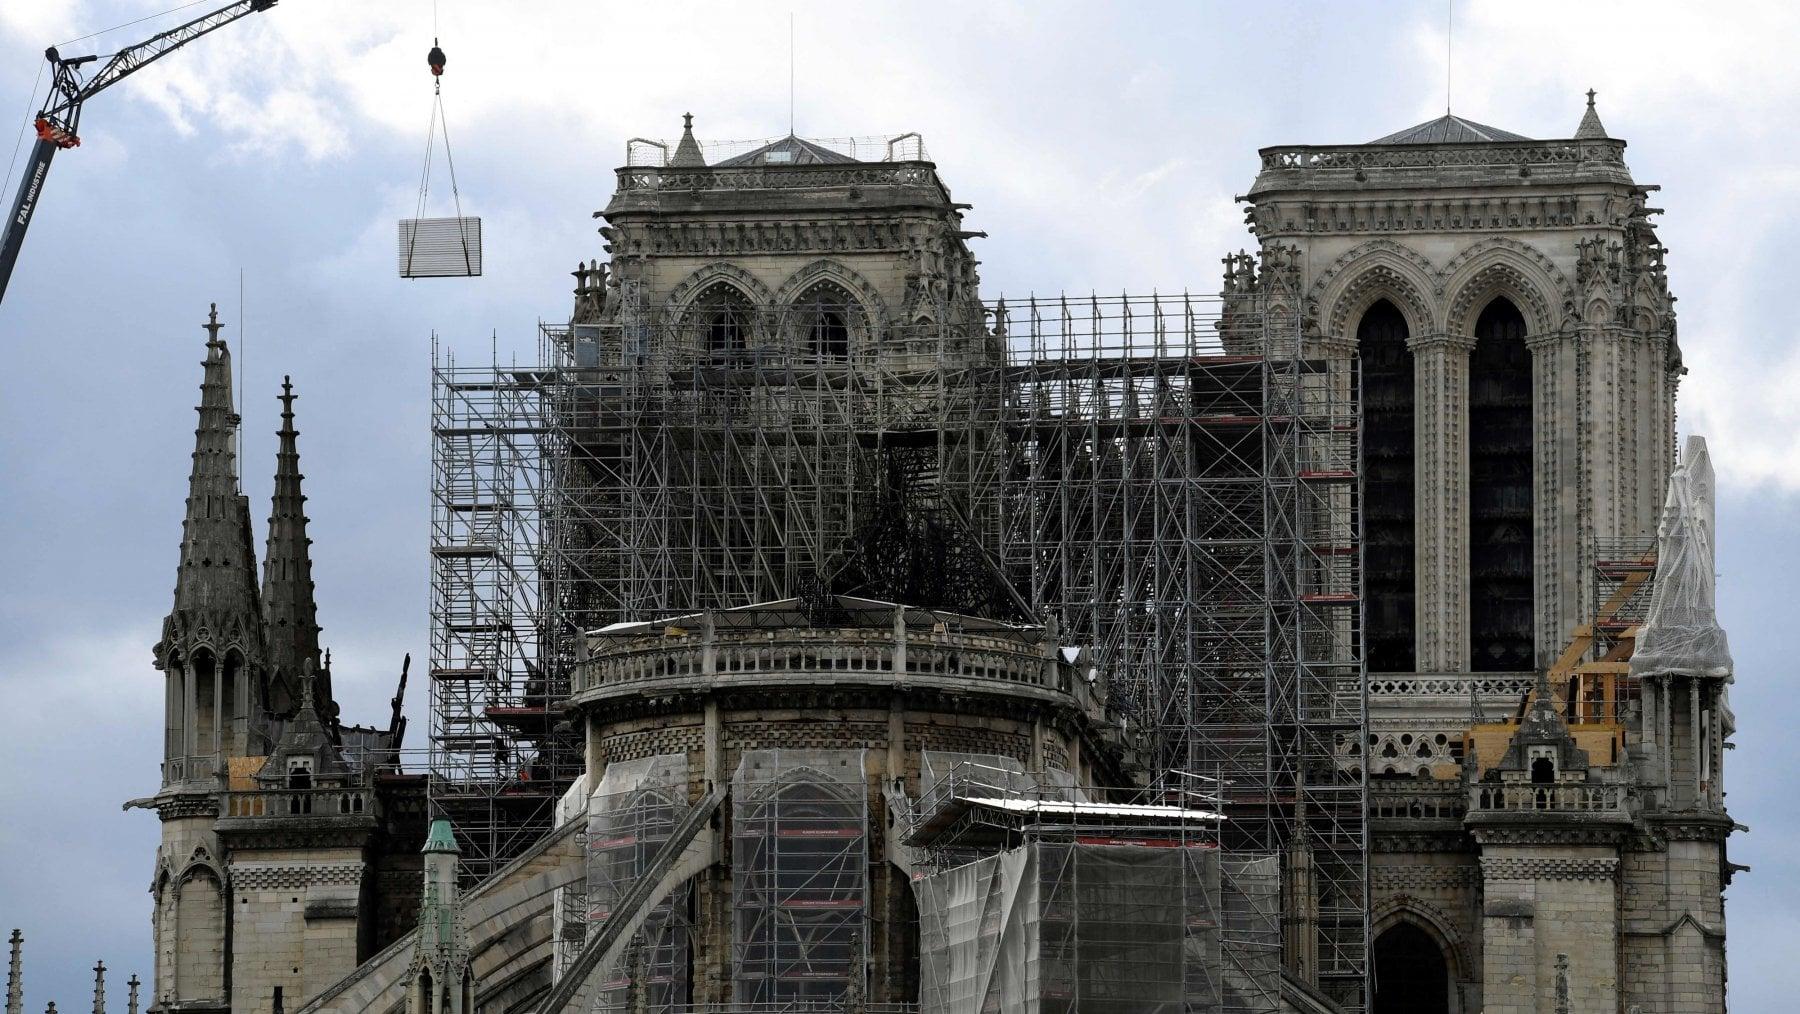 "223505509 e988e81e f782 437b a668 093721a68beb - Francia, Macron sul tetto di Notre-Dame: ""Reggeremo e ricostruiremo"""